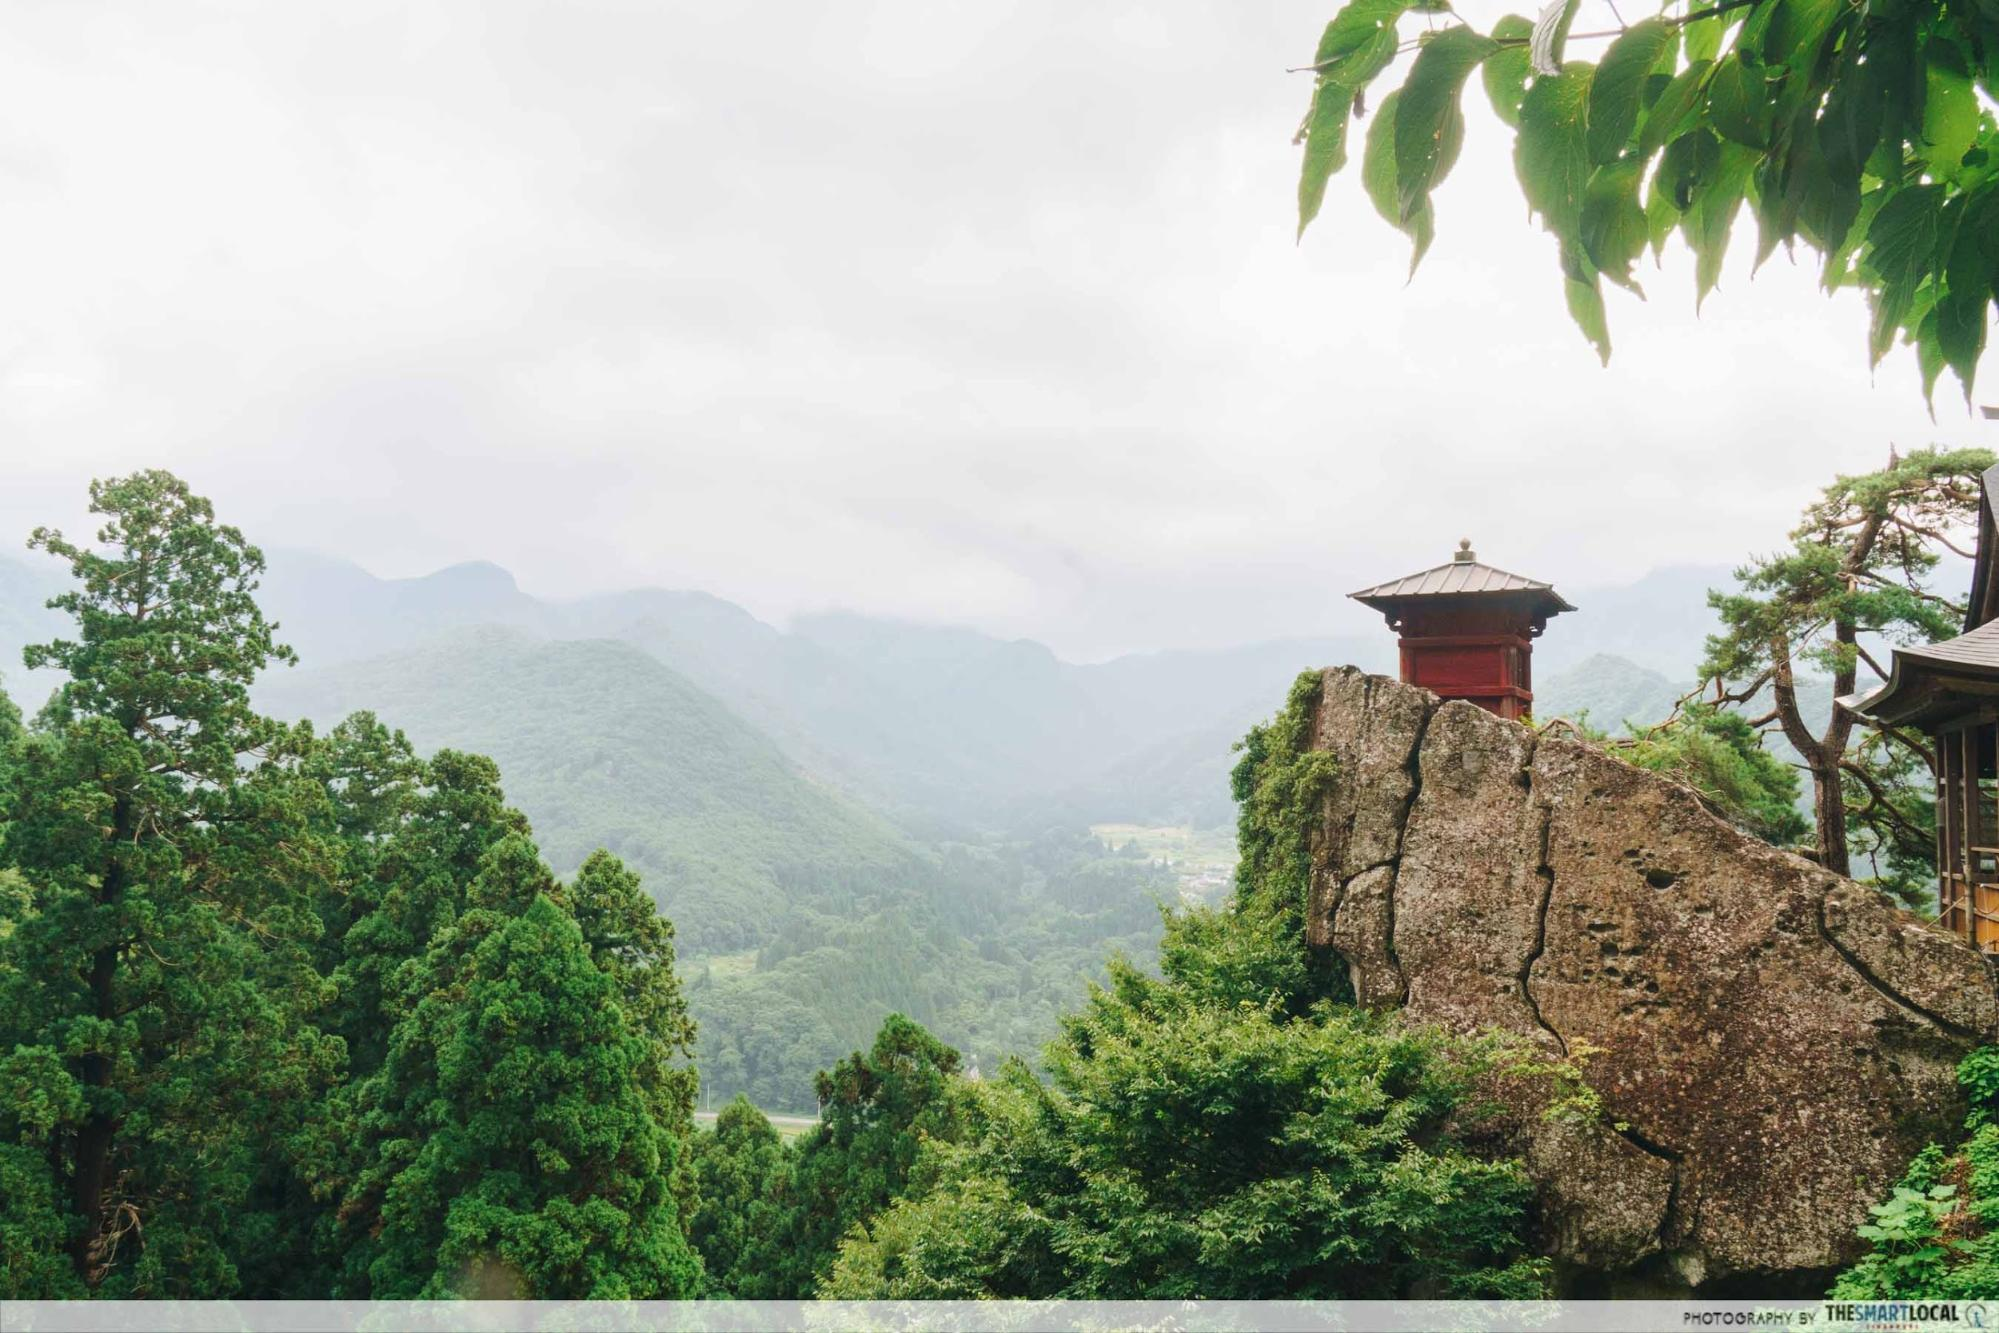 Tohoku Japan - tendai buddhist temple